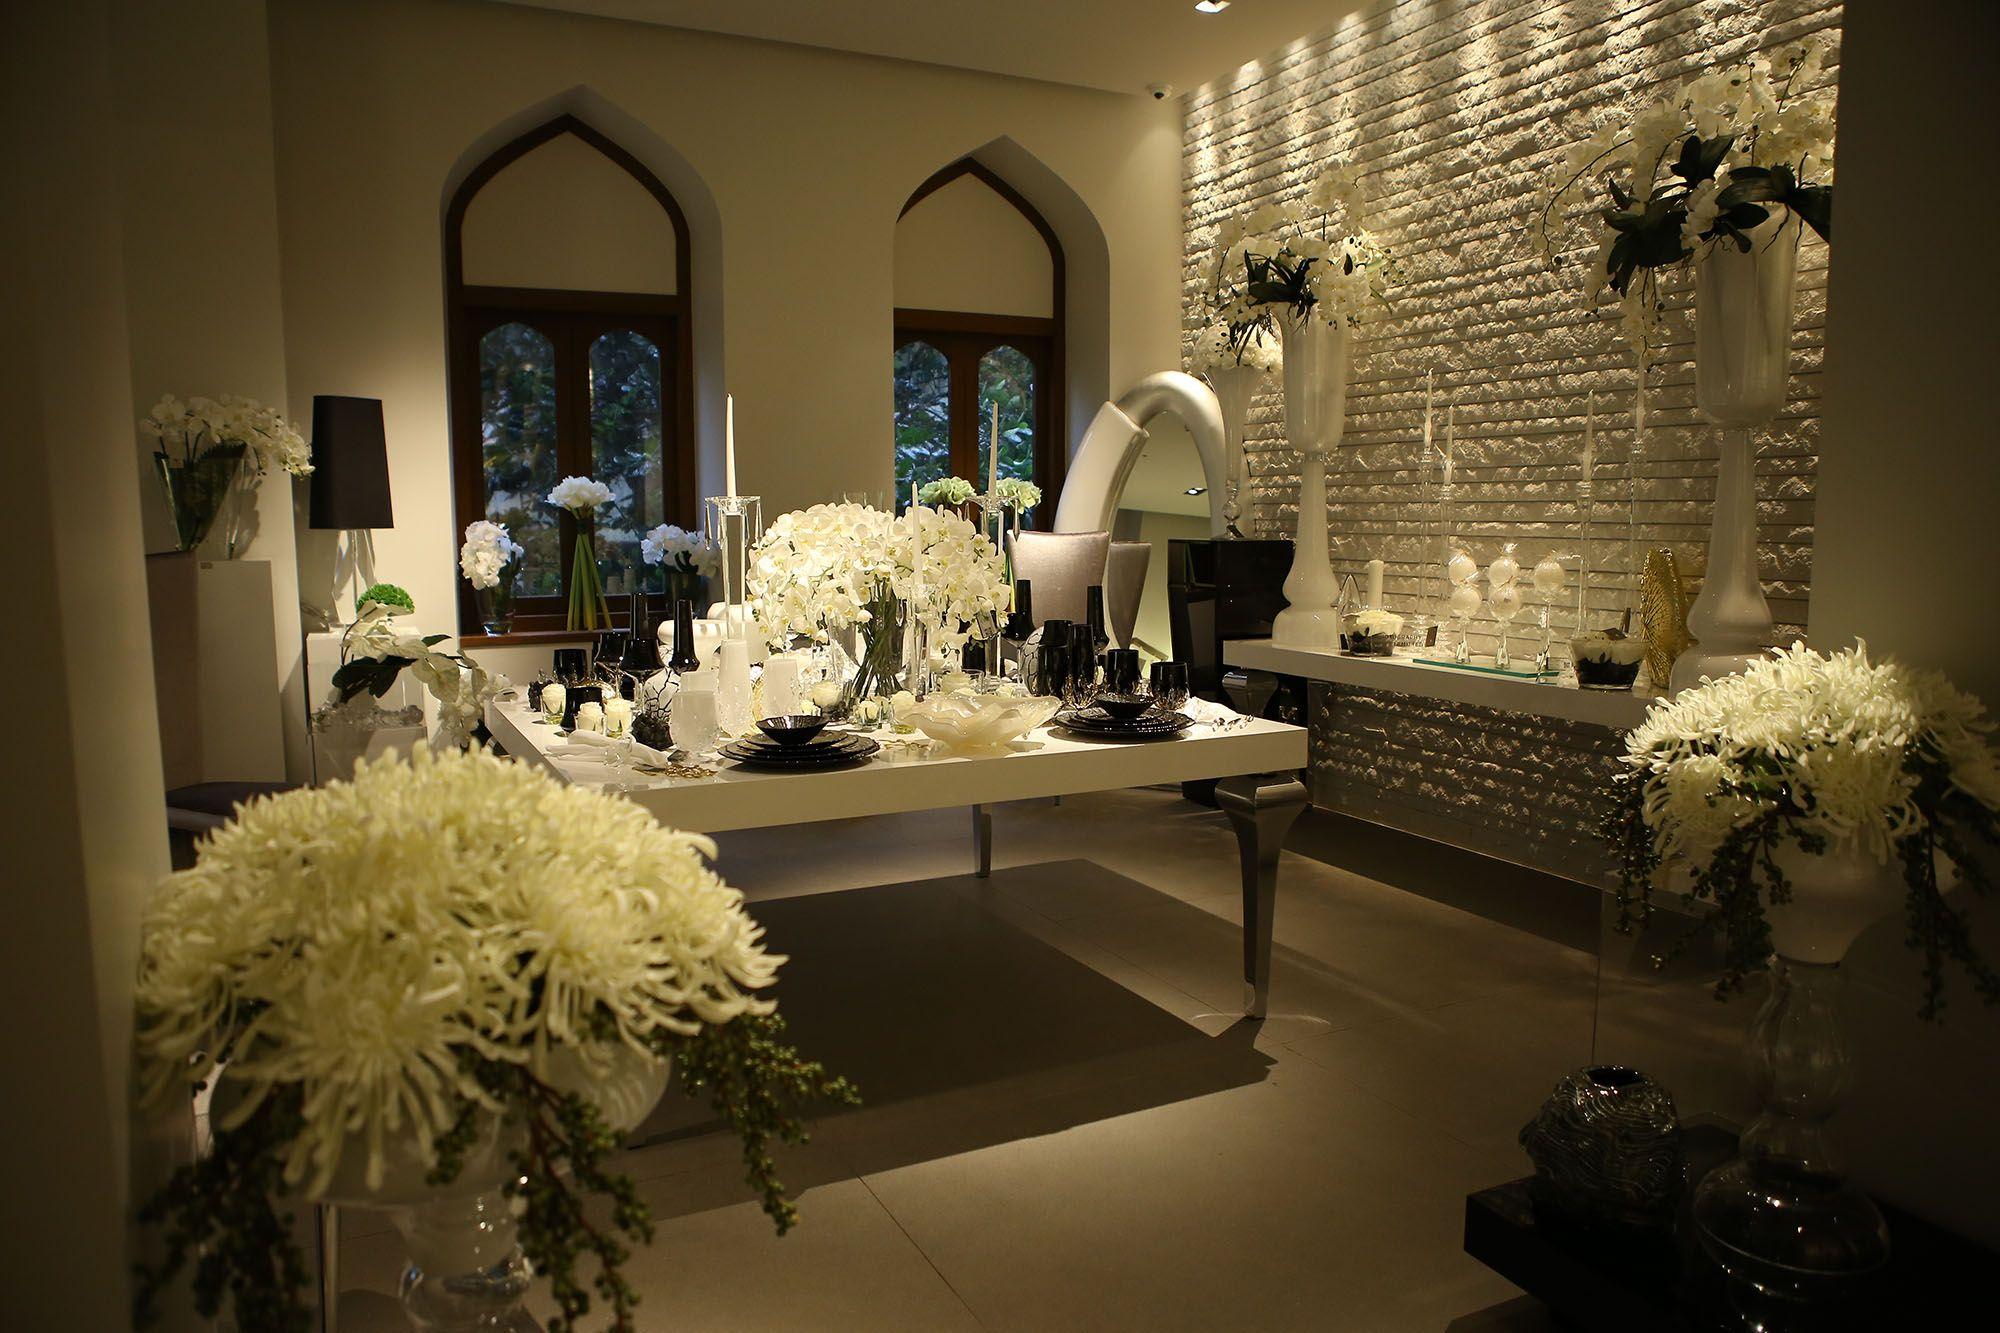 Sofa Set Showroom In Mumbai Roma Futon Bed Simone Arora 39s New Store Opening Vg Table